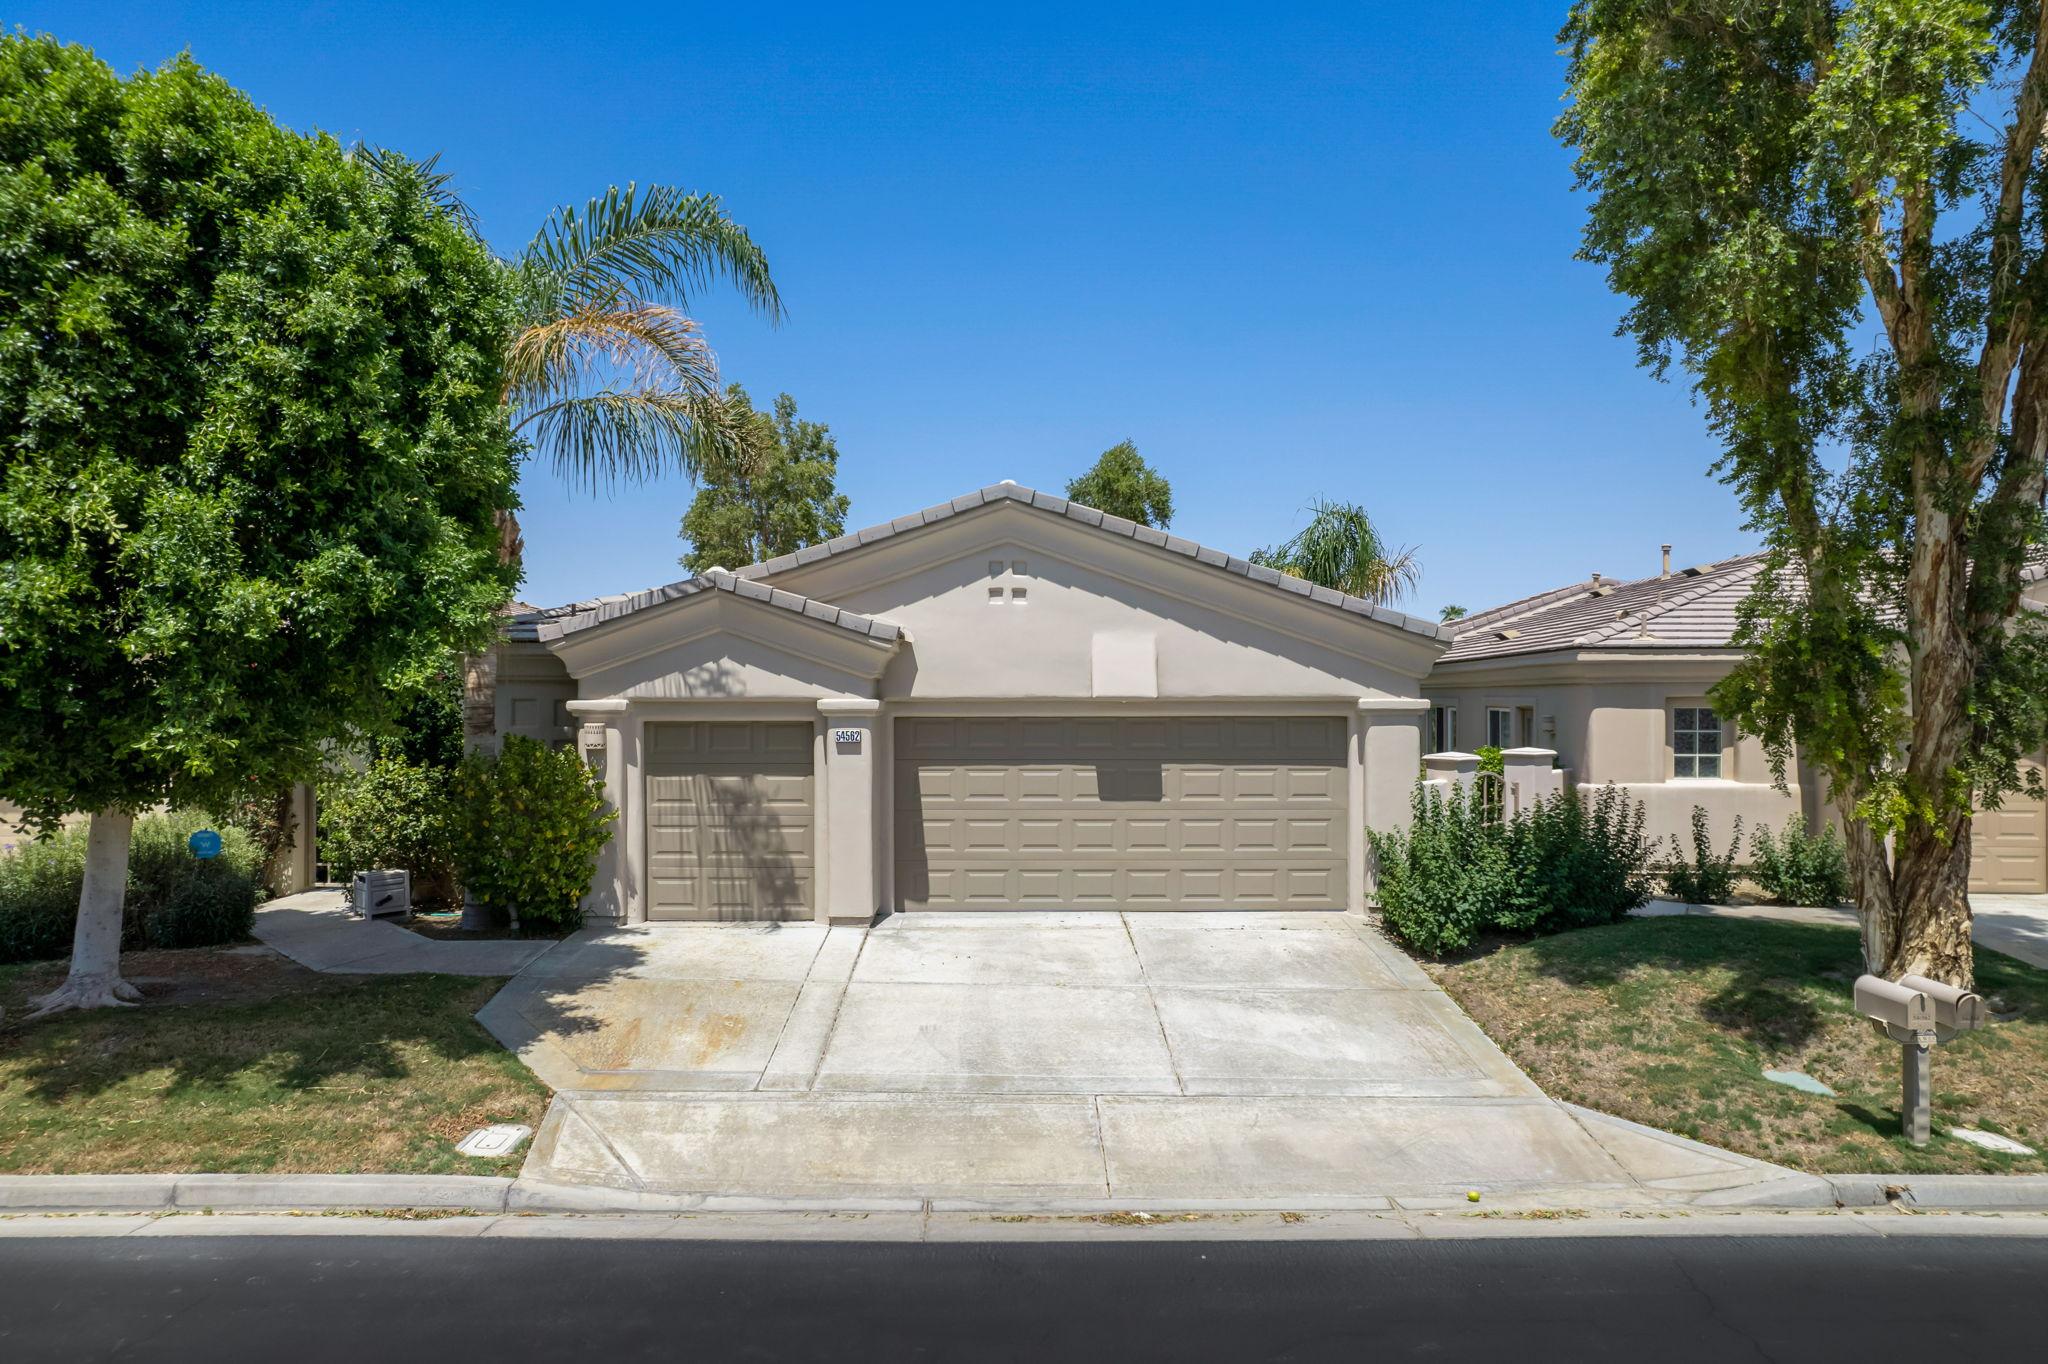 54562 Tanglewood, La Quinta, CA 92253, USA Photo 1